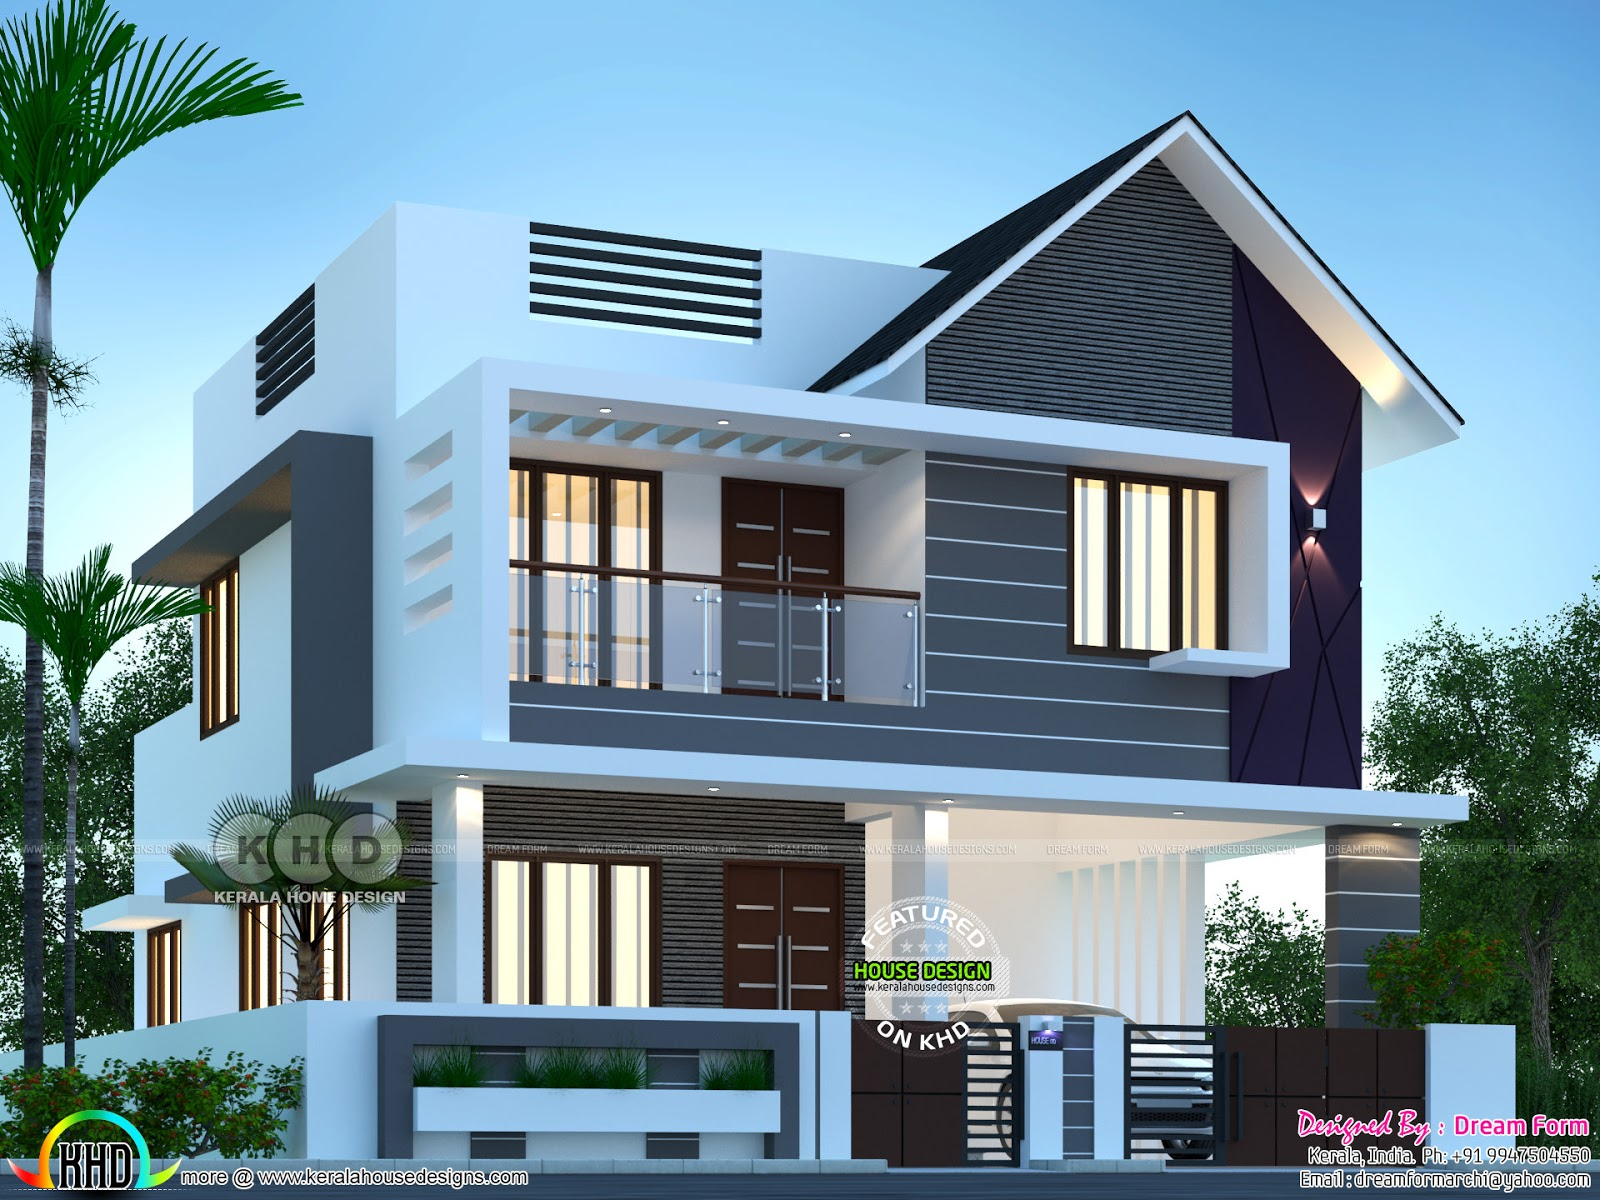 3 Bedroom Mixed Roof House 1810 Sq Ft Kerala Home Design Bloglovin